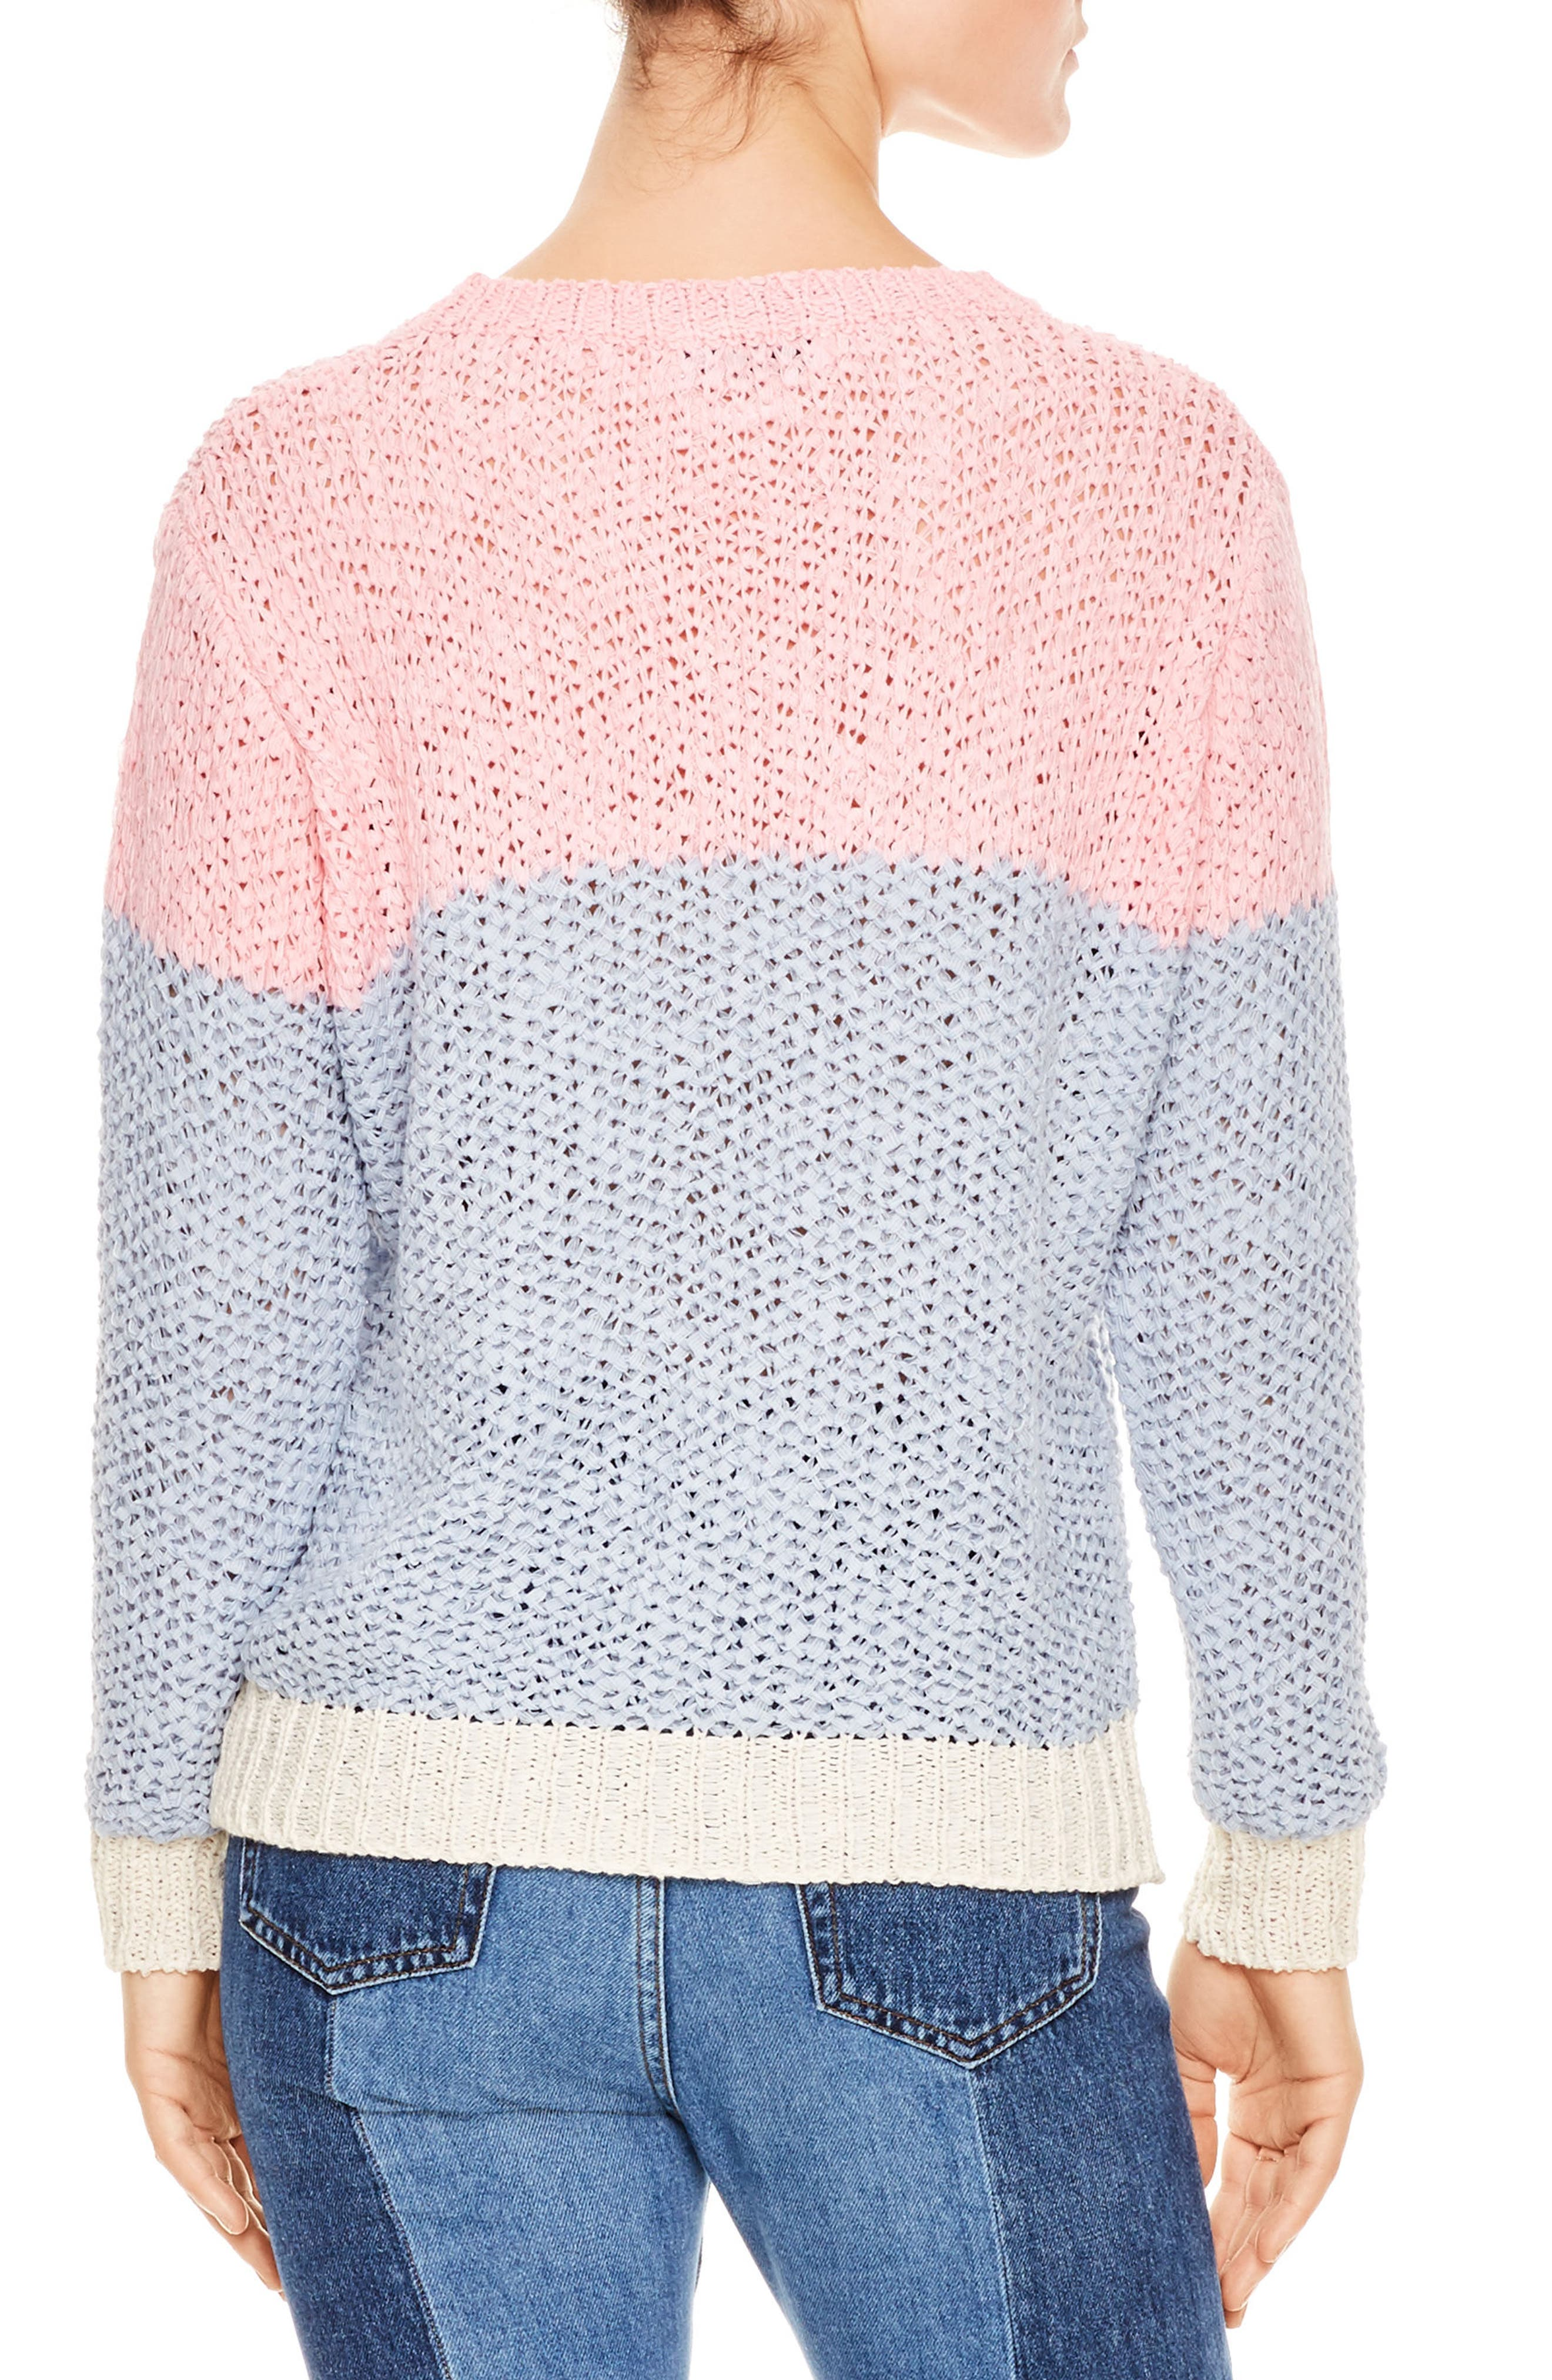 Malabar Colorblock Knit Sweater,                             Alternate thumbnail 2, color,